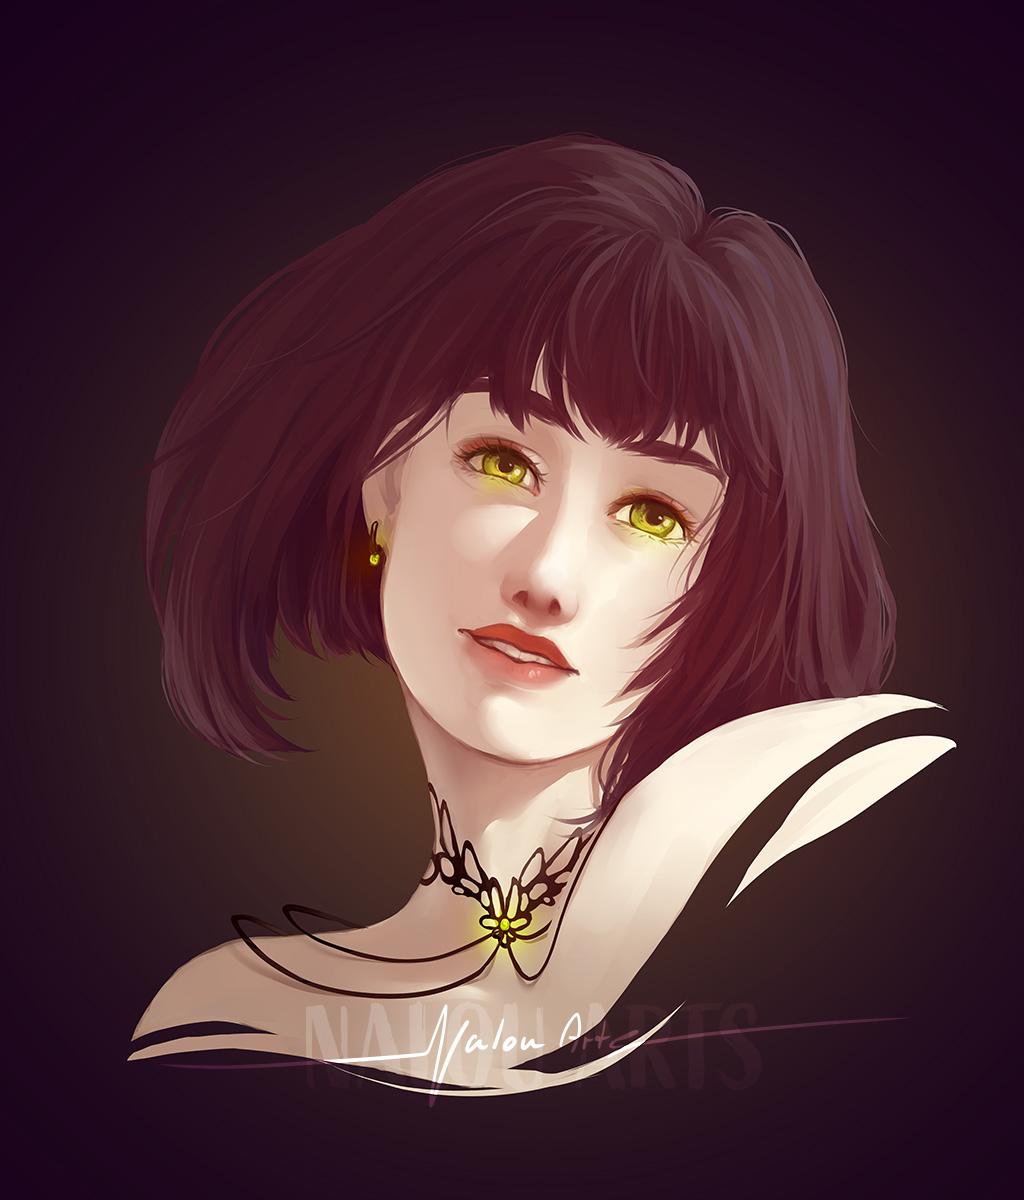 nalou_arts_valery